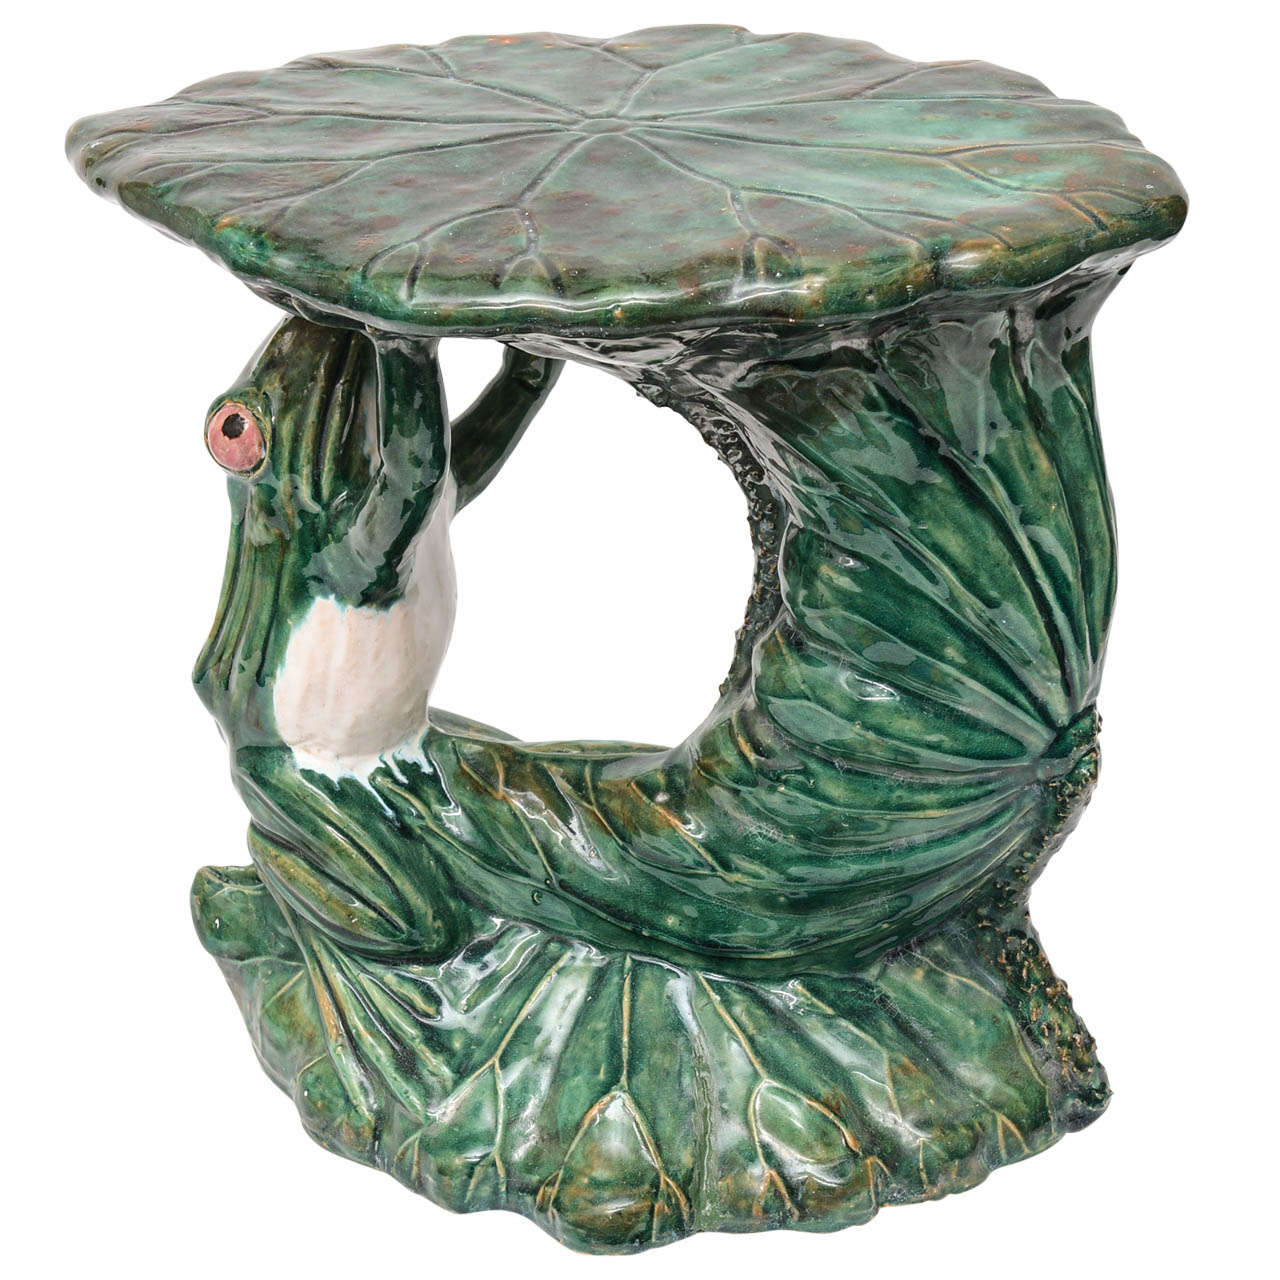 Antique Majolica Frog Garden Seat At 1stdibs